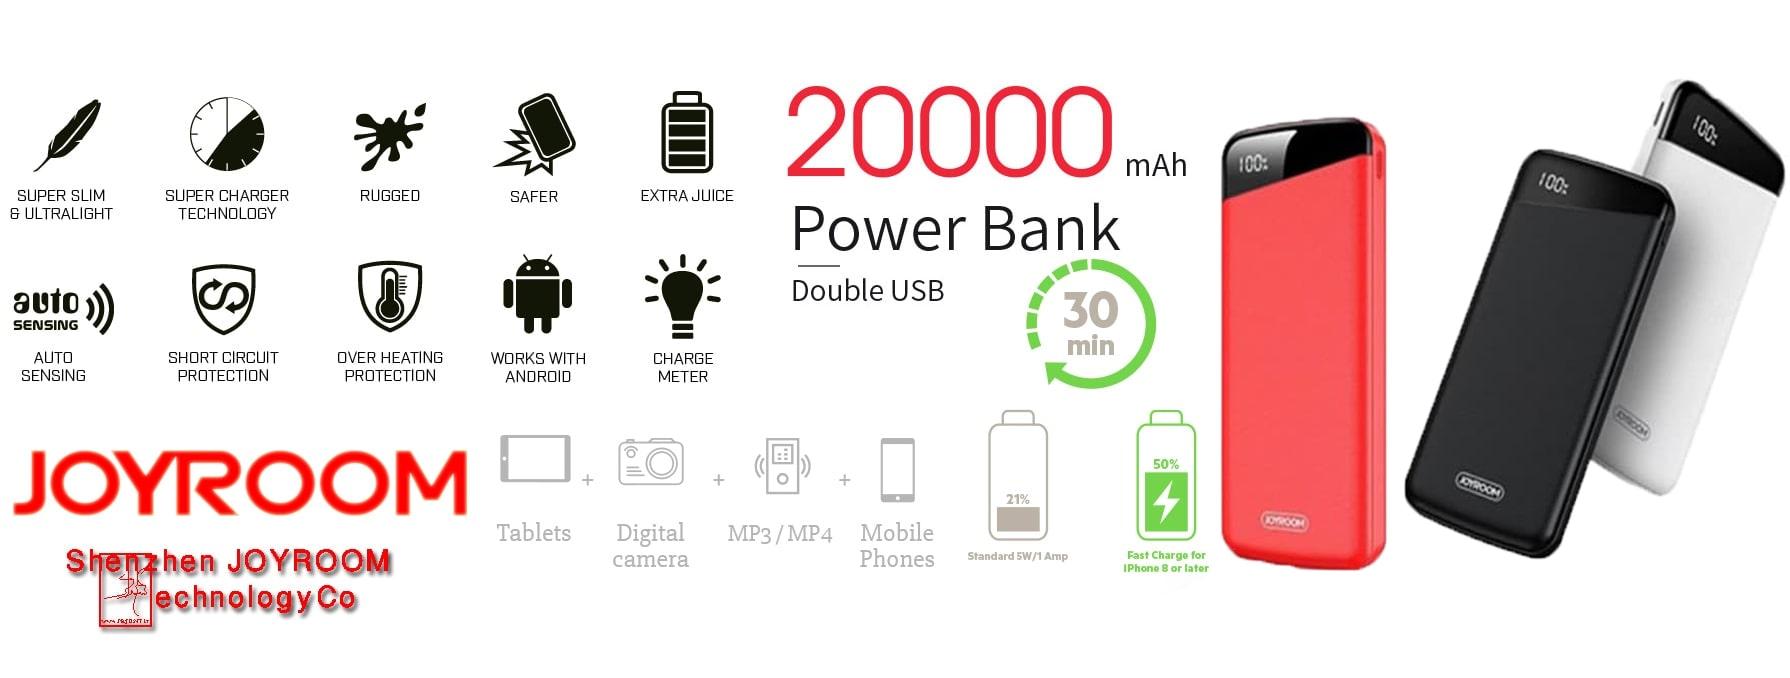 پاور بانک جویروم 20000 میلی آمپر Joyroom DM-195 Plus RED